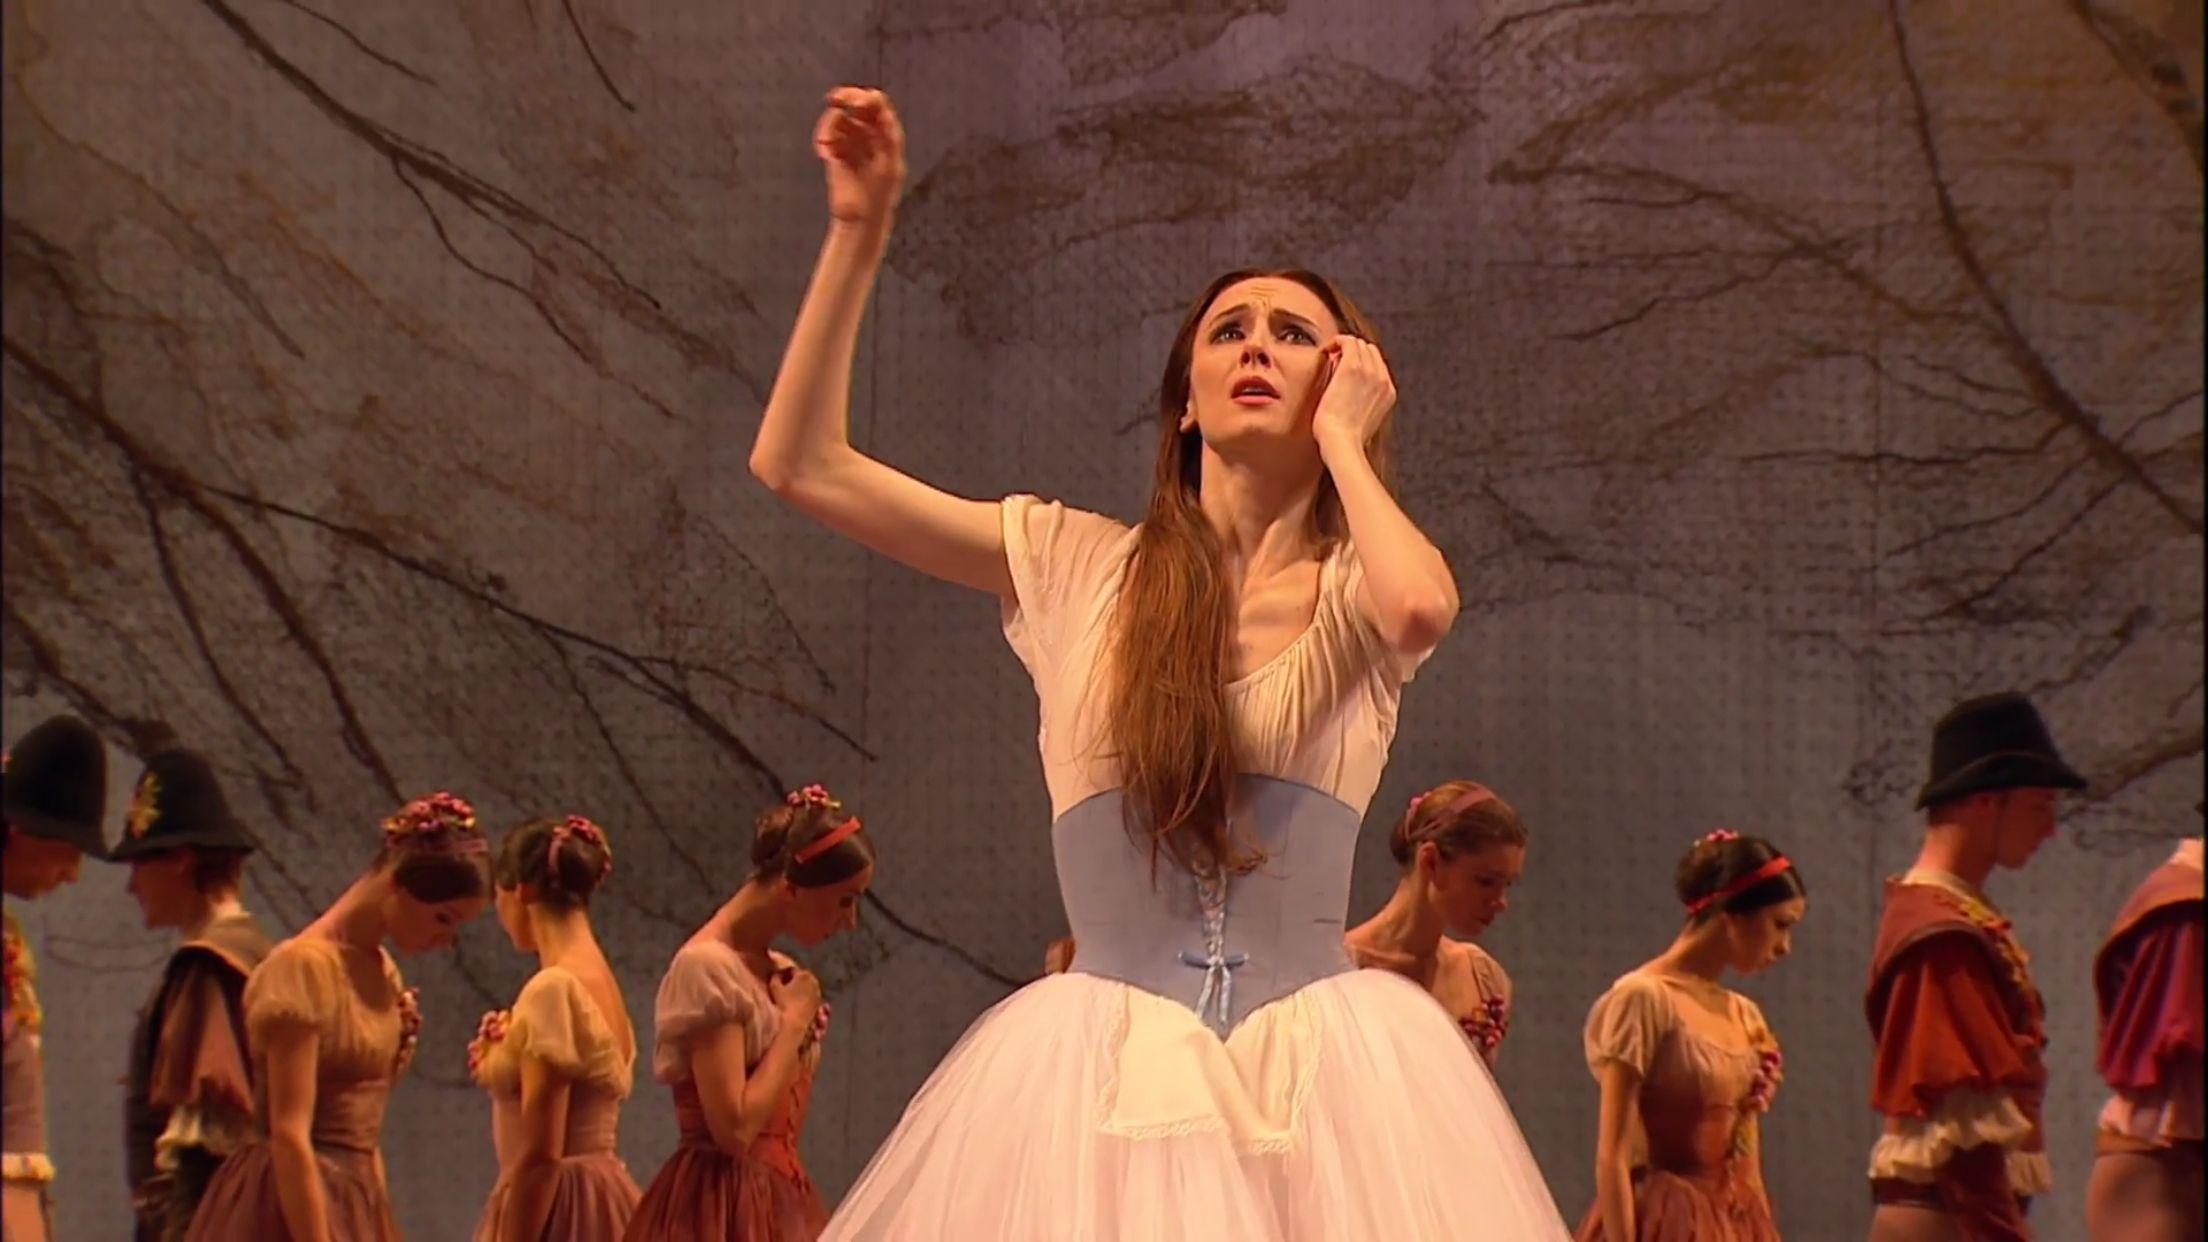 Bolshoi Giselle YouTube Live Stream 11.10.2015 screen captures (by me)